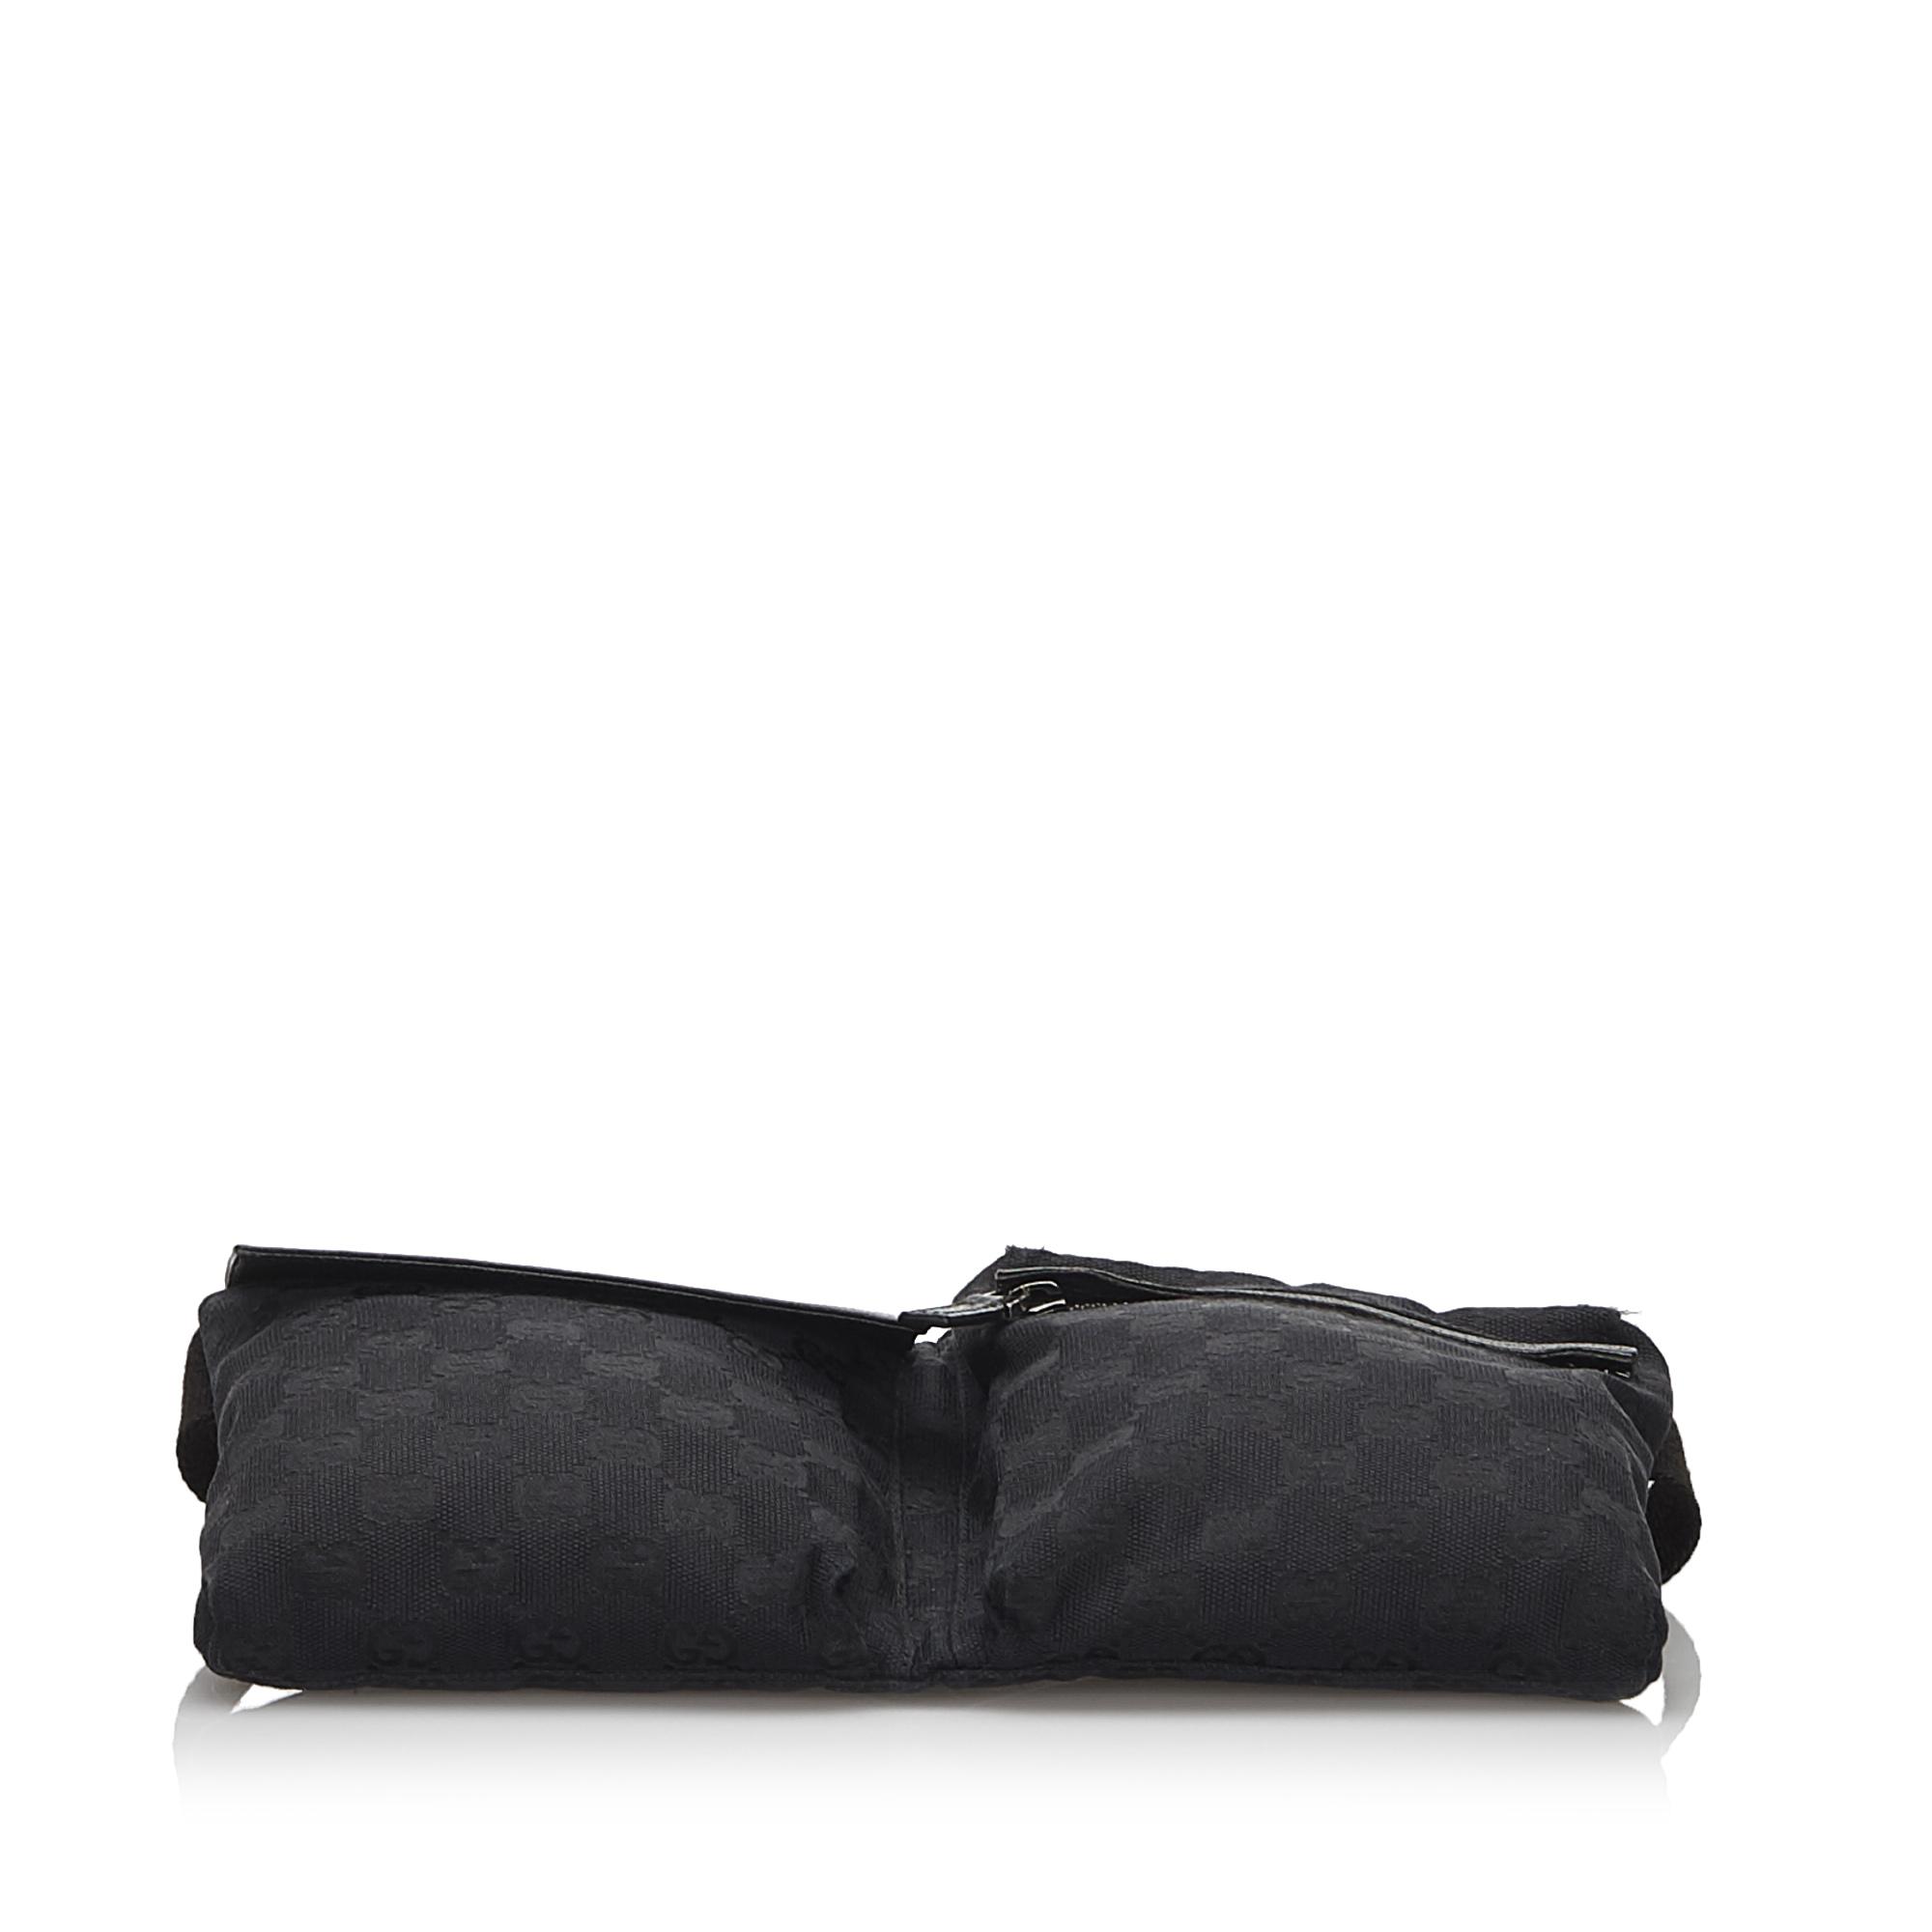 Gucci Black GG Canvas Belt Bag